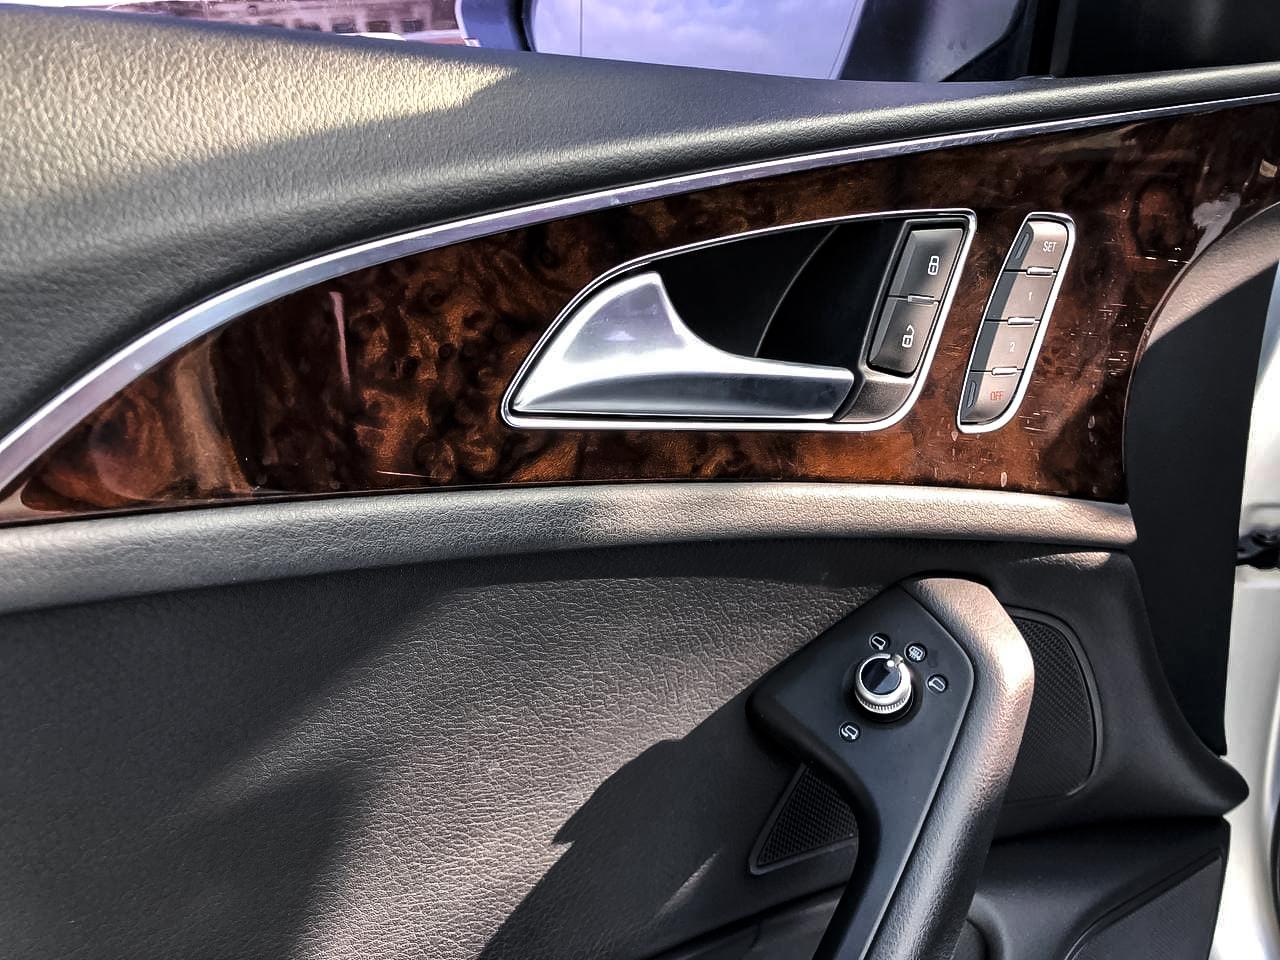 2015 Audi A6 | Vin: WAUZZZ4G5FN050605